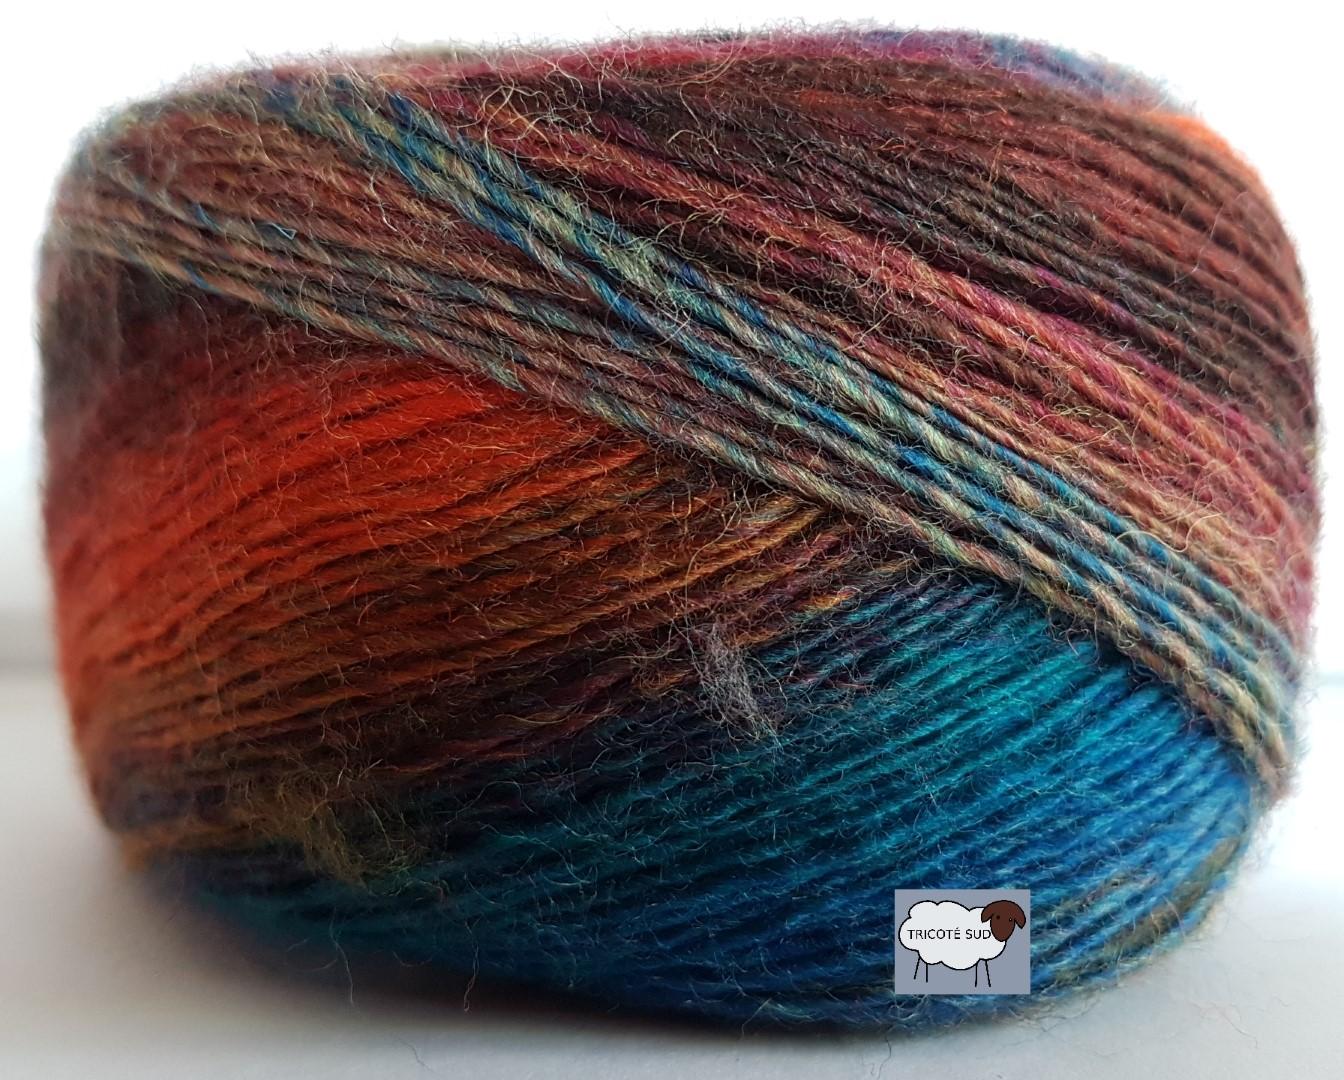 GRETA LANG YARNS COLORIS 56 (3) (Large)